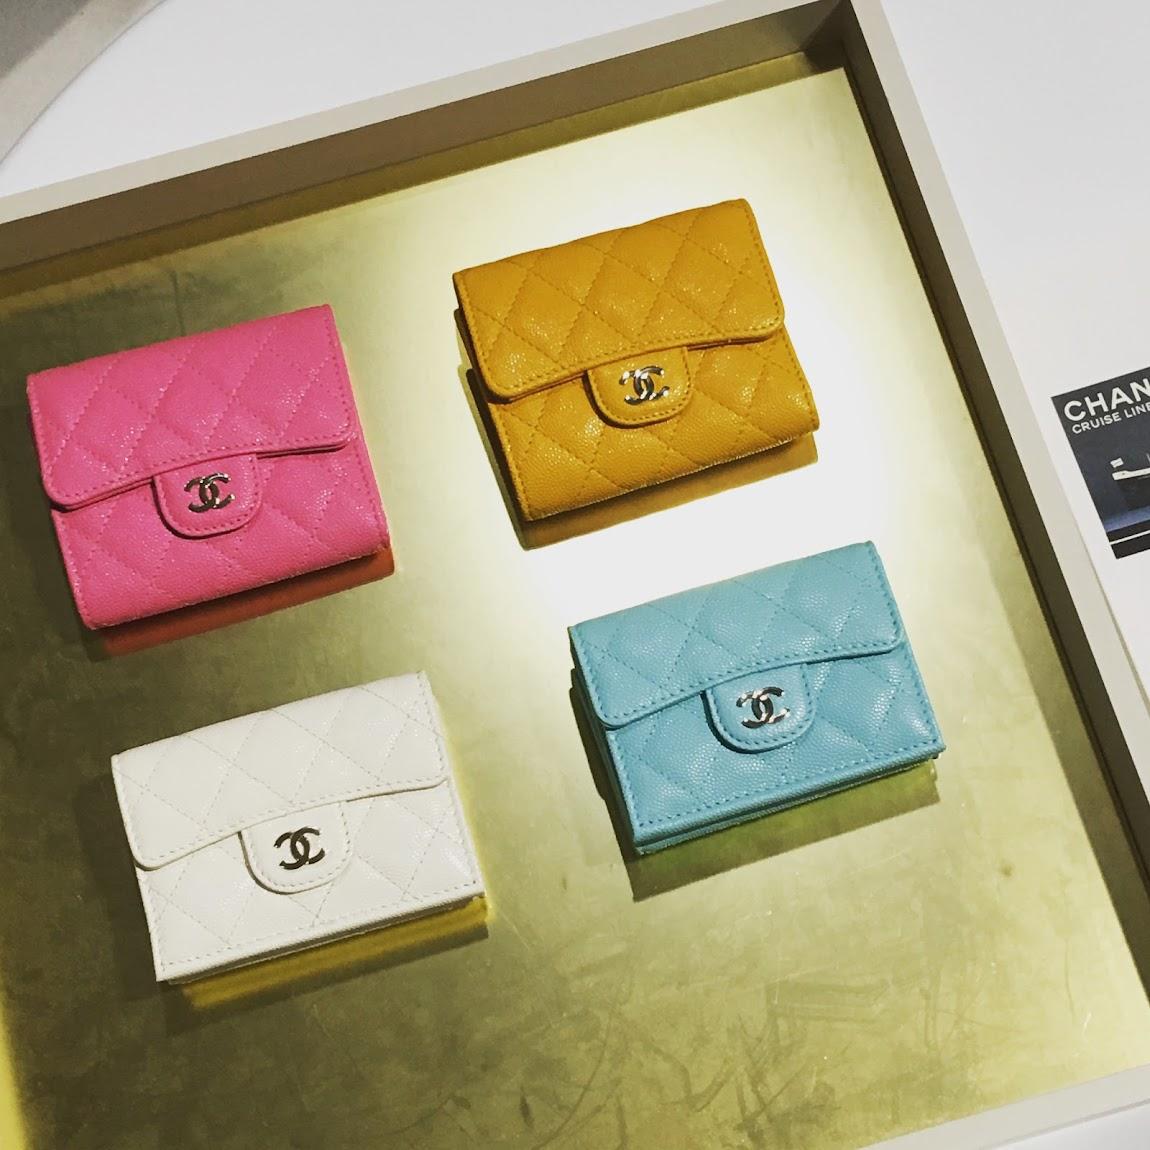 new style d40f4 76e08 人気はますます拡大中。ミニ財布のブランド新作をチェック【展示 ...